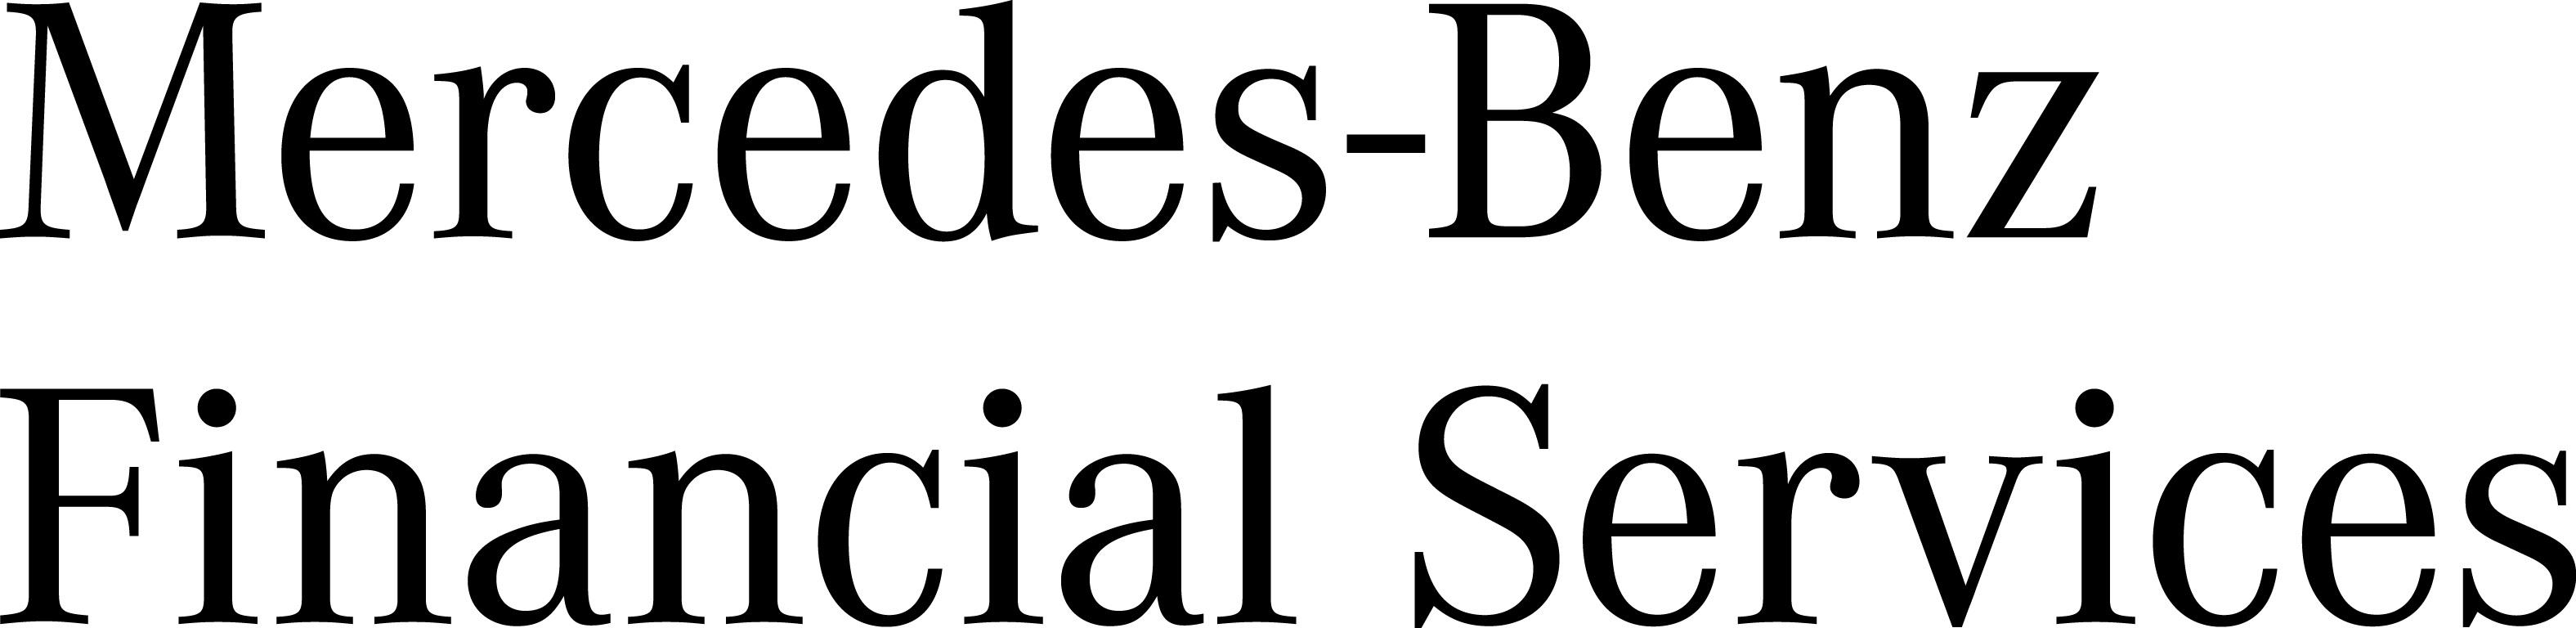 Mercedes-Benz Financial Services